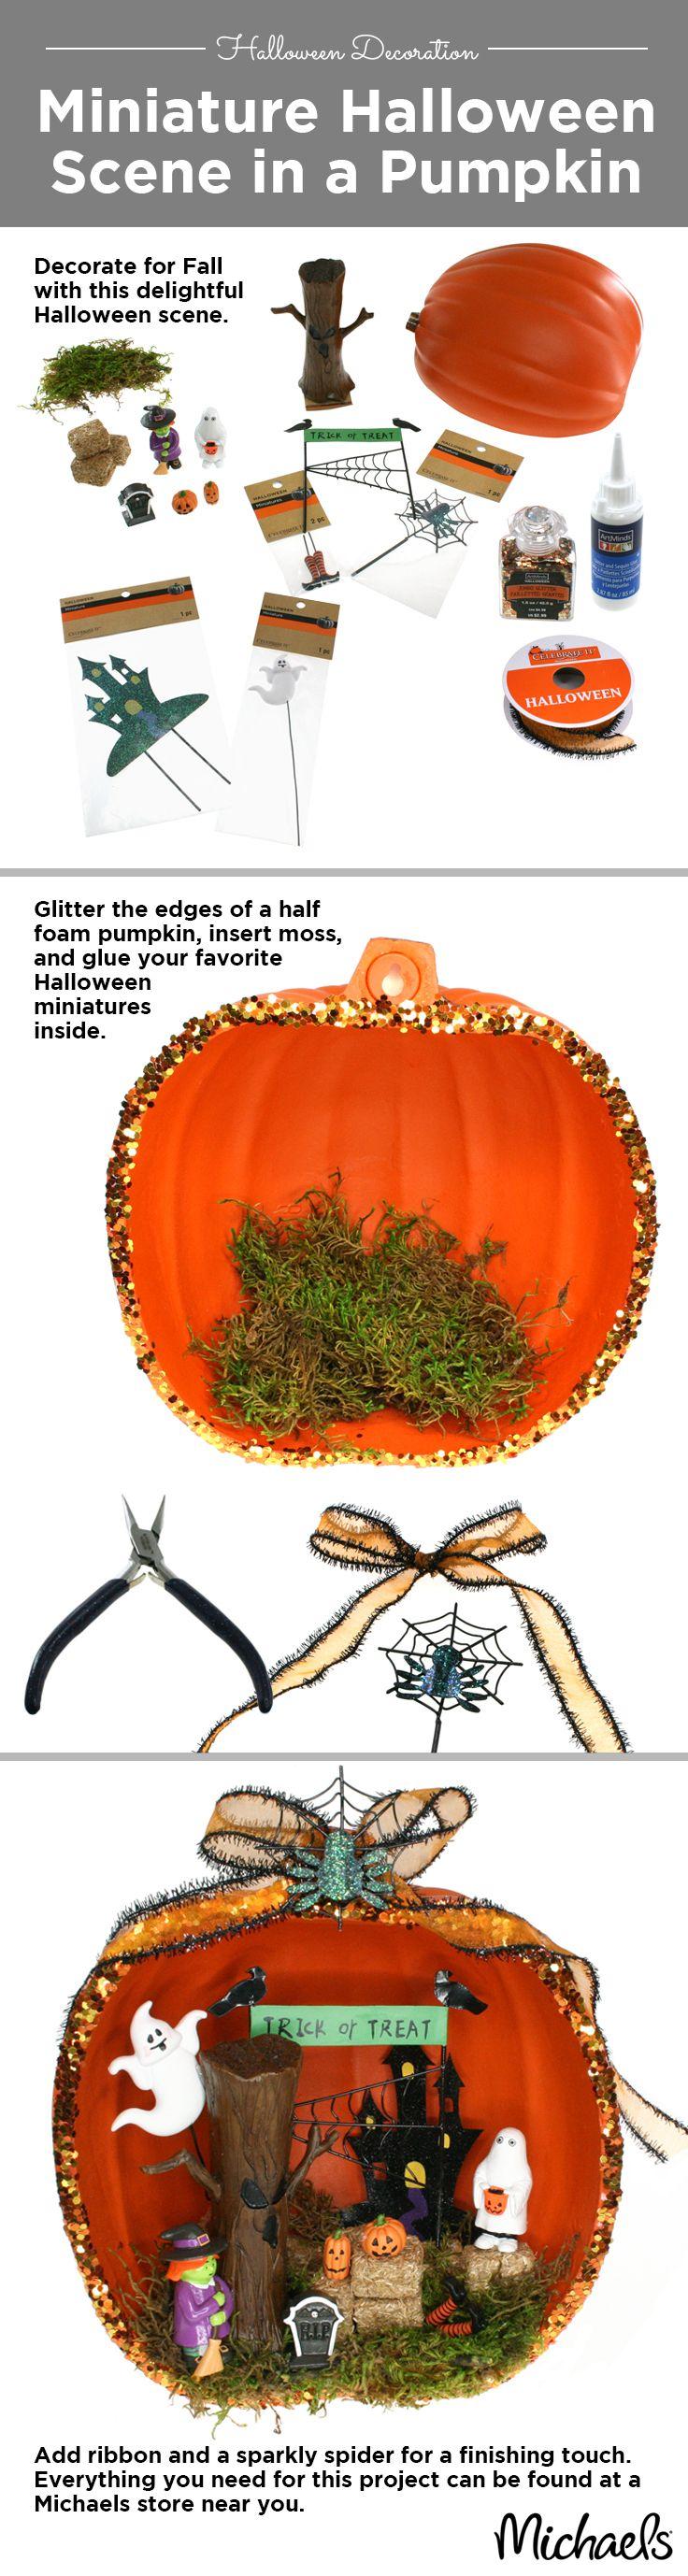 Create A Miniature Halloween Scene In A Pumpkin To Make